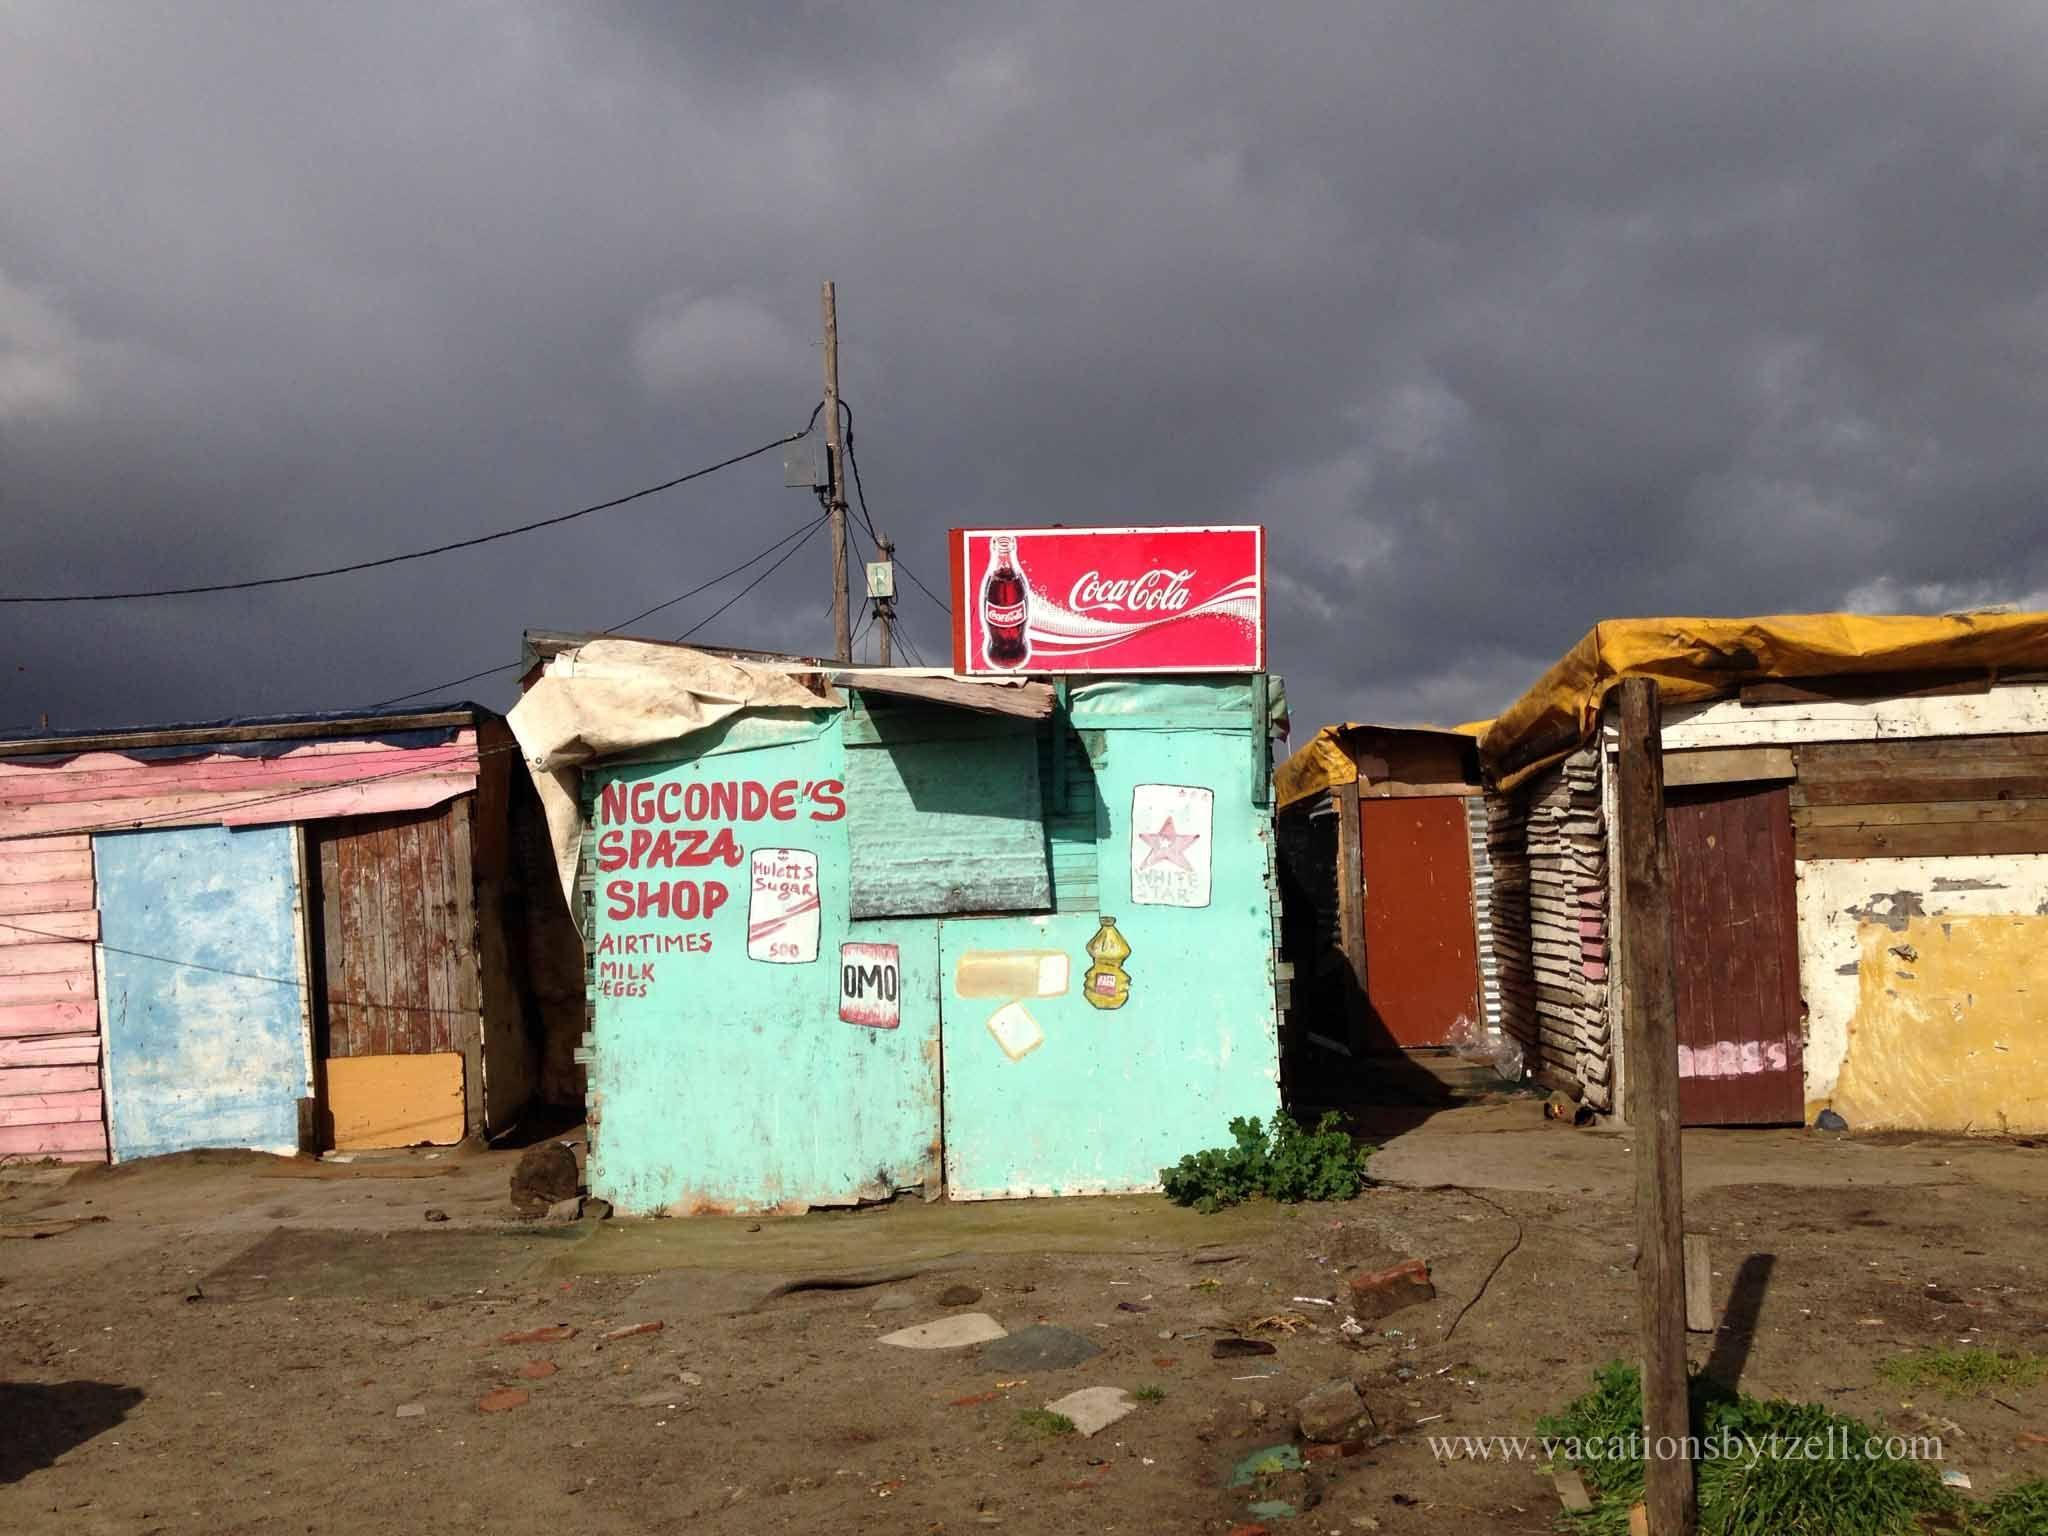 Incontri indiani in Kenya